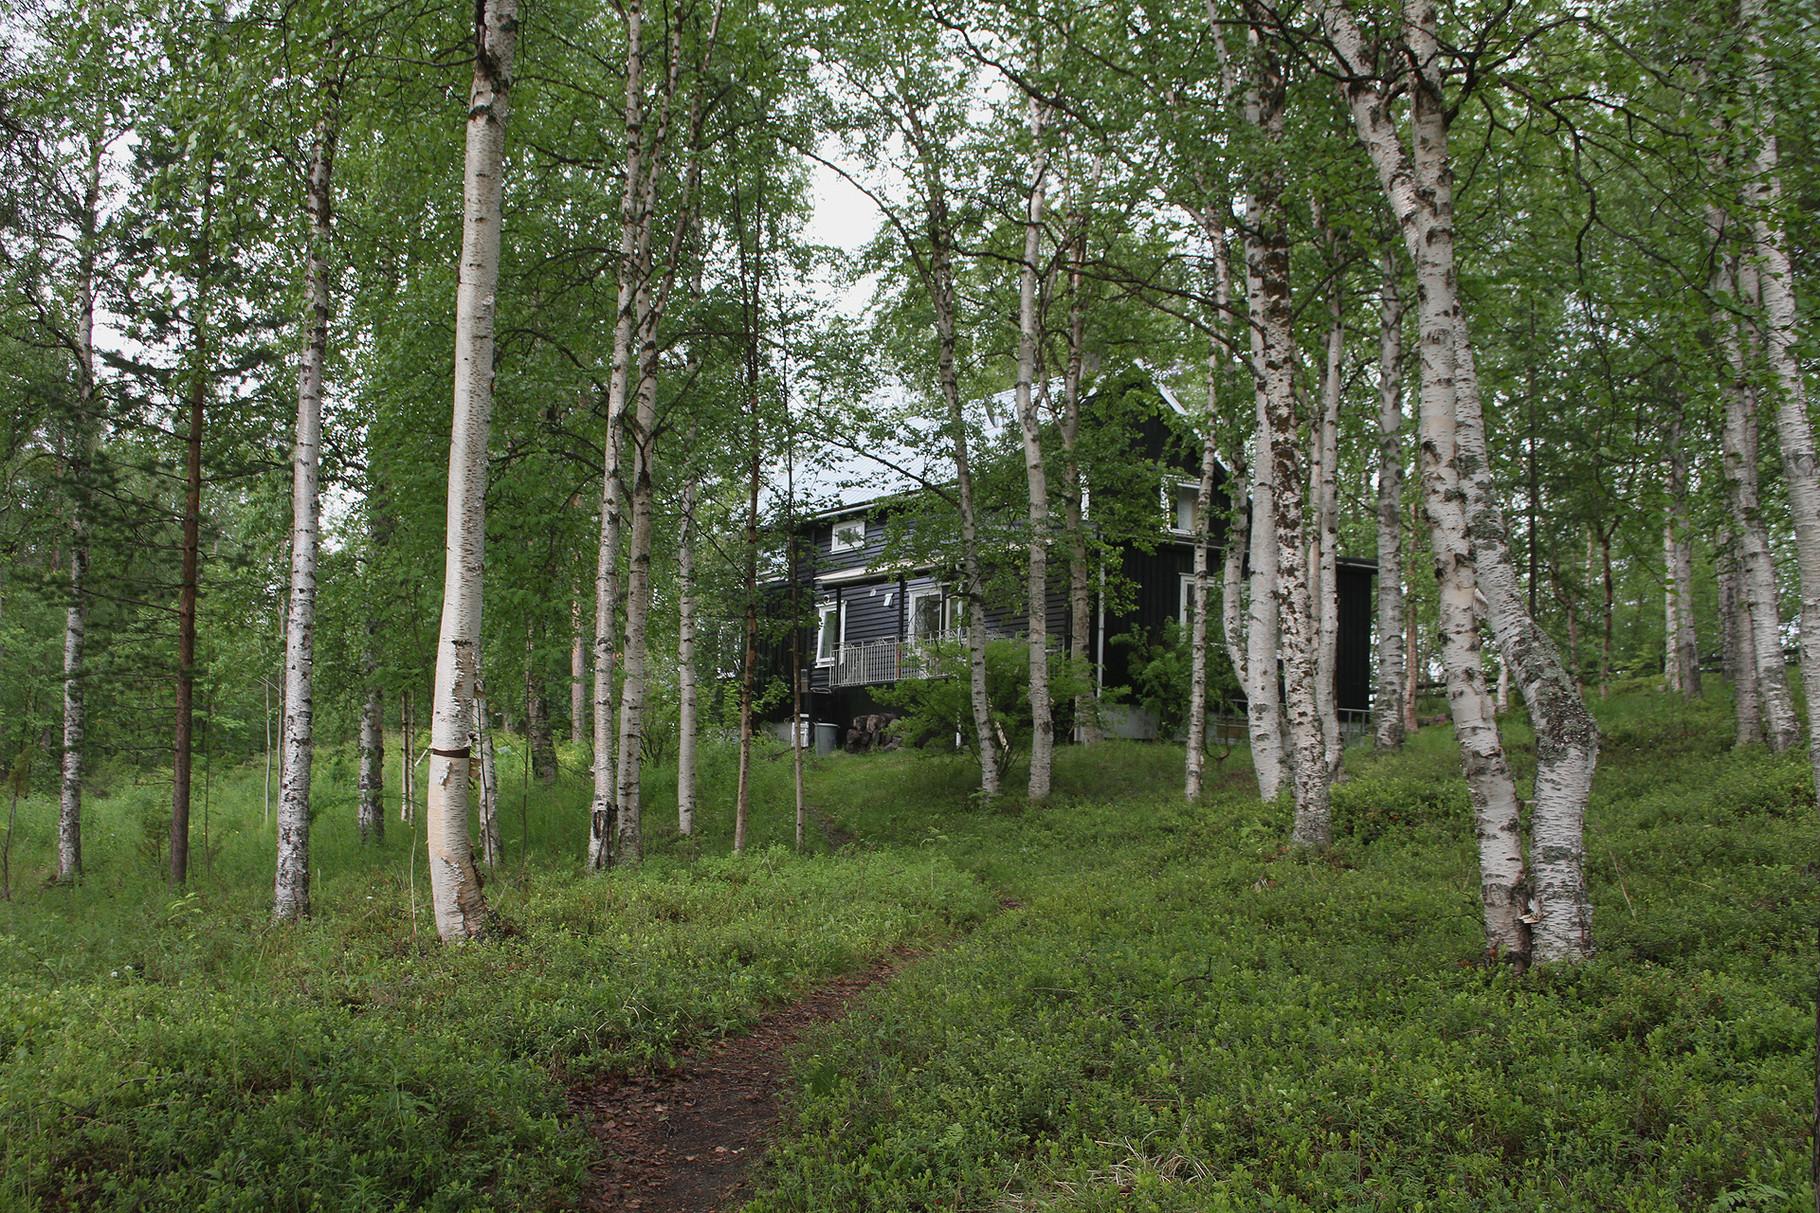 Schön gelegen direkt am Pasvik-Fluss: unsere Unterkunft Birk Husky B&B